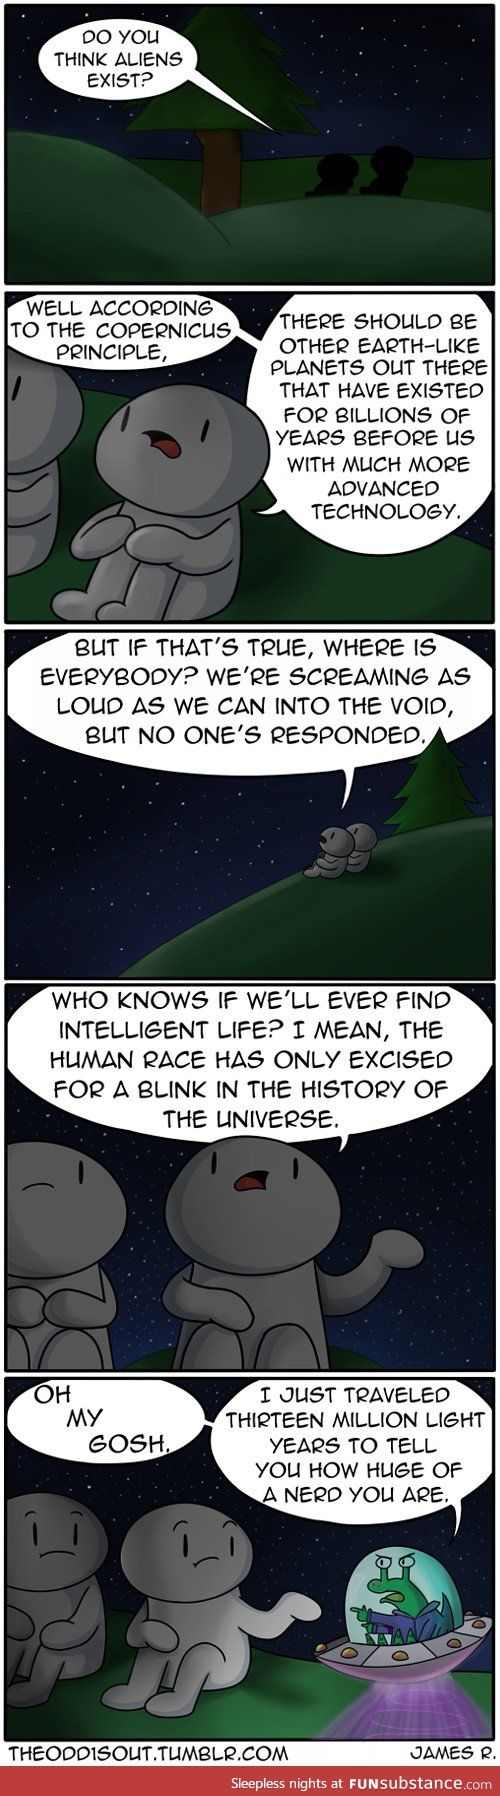 Do you believe aliens essay